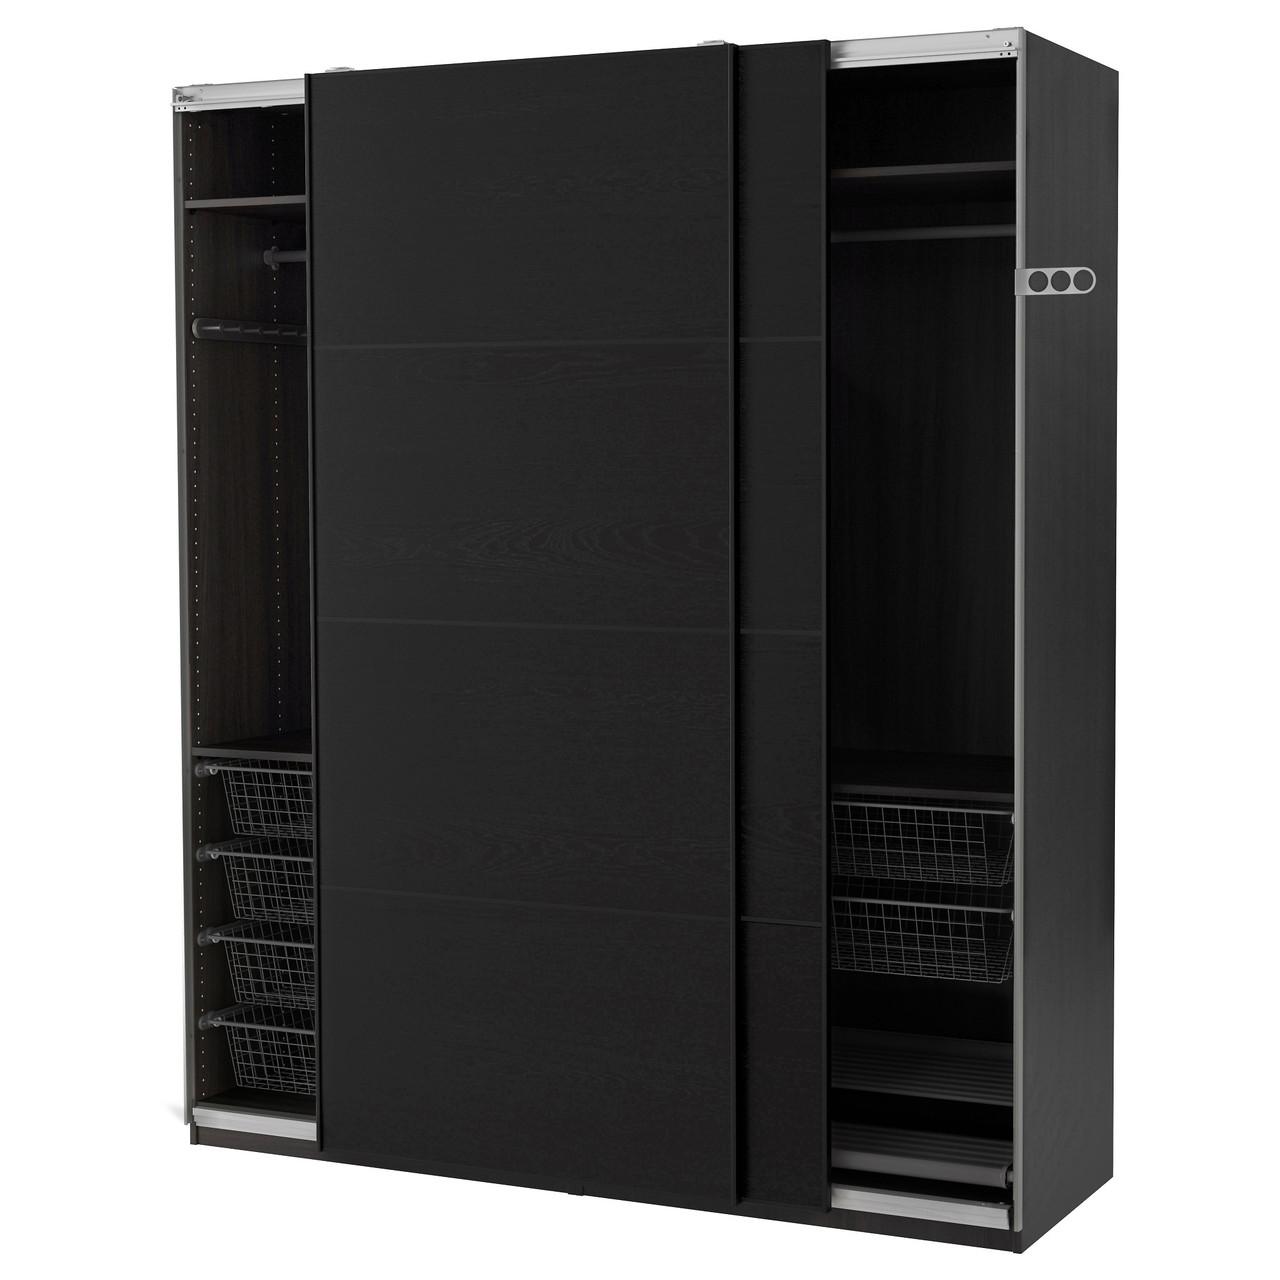 PAX 891.273.69 Гардероб, черно-коричневый, Ilseng blackberry, 200x66x236 см